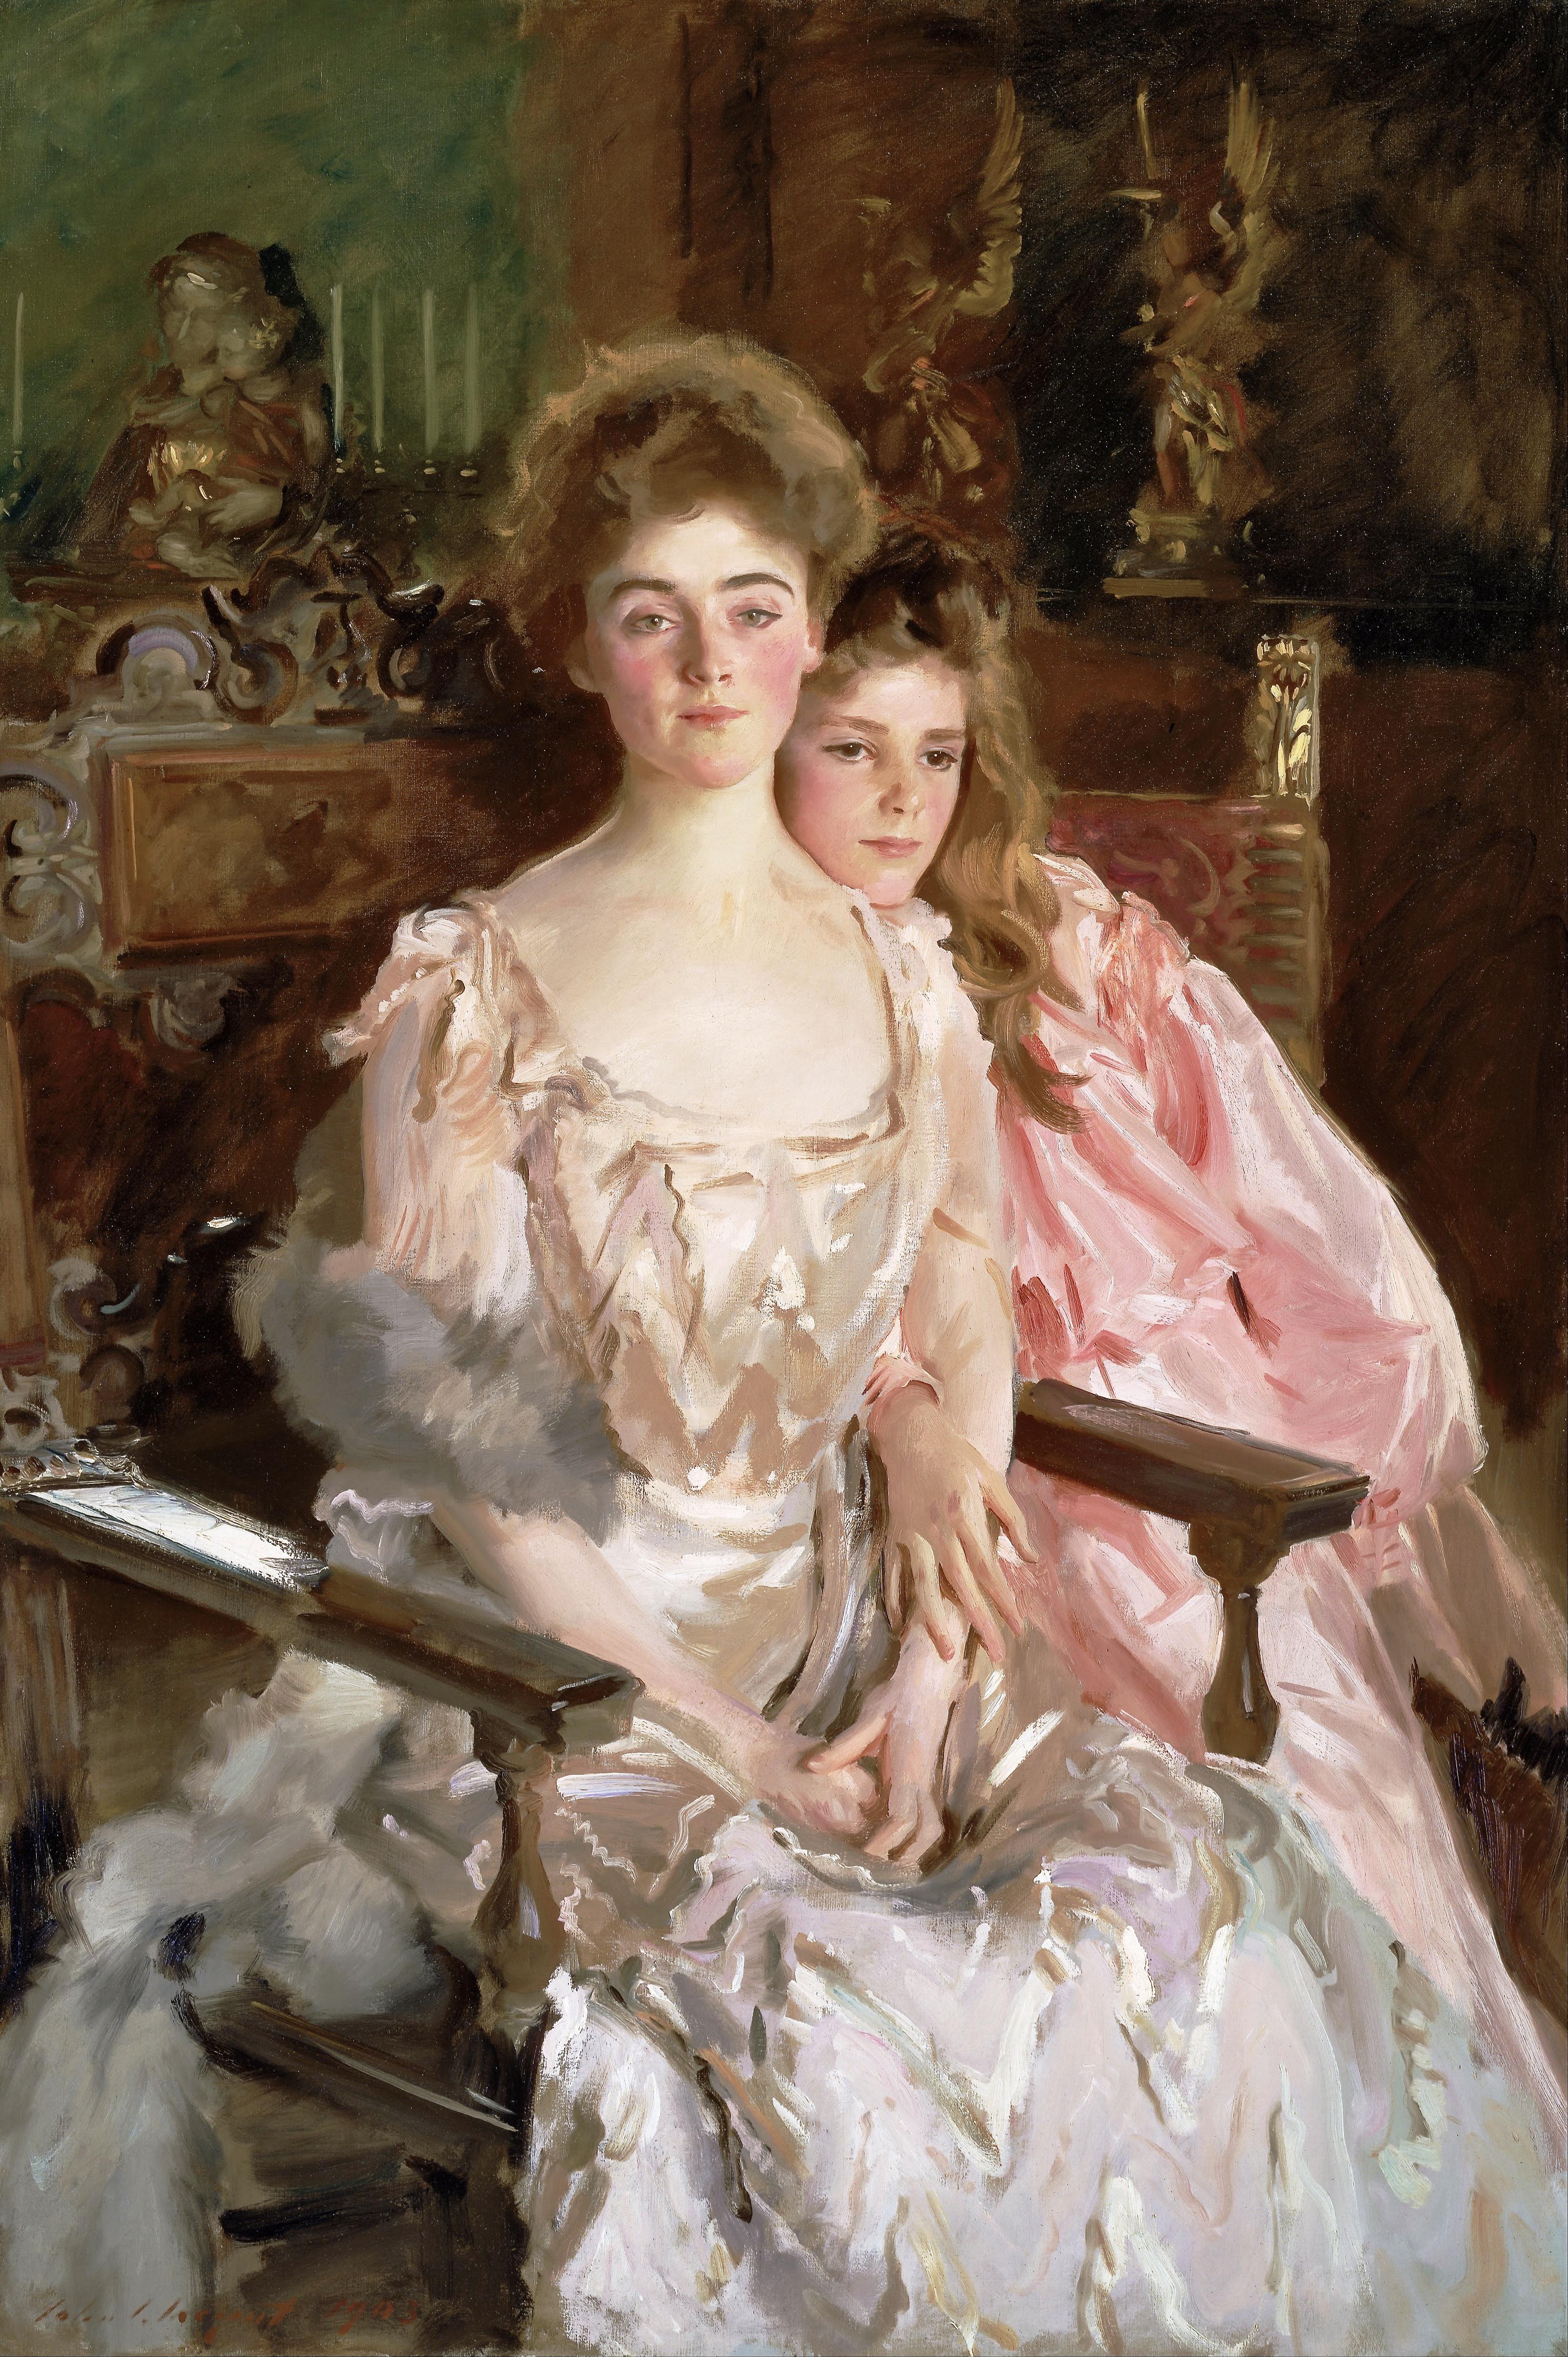 John_Singer_Sargent_-_Mrs._Fiske_Warren_(Gretchen_Osgood)_and_Her_Daughter_Rachel_-_Google_Art_Project